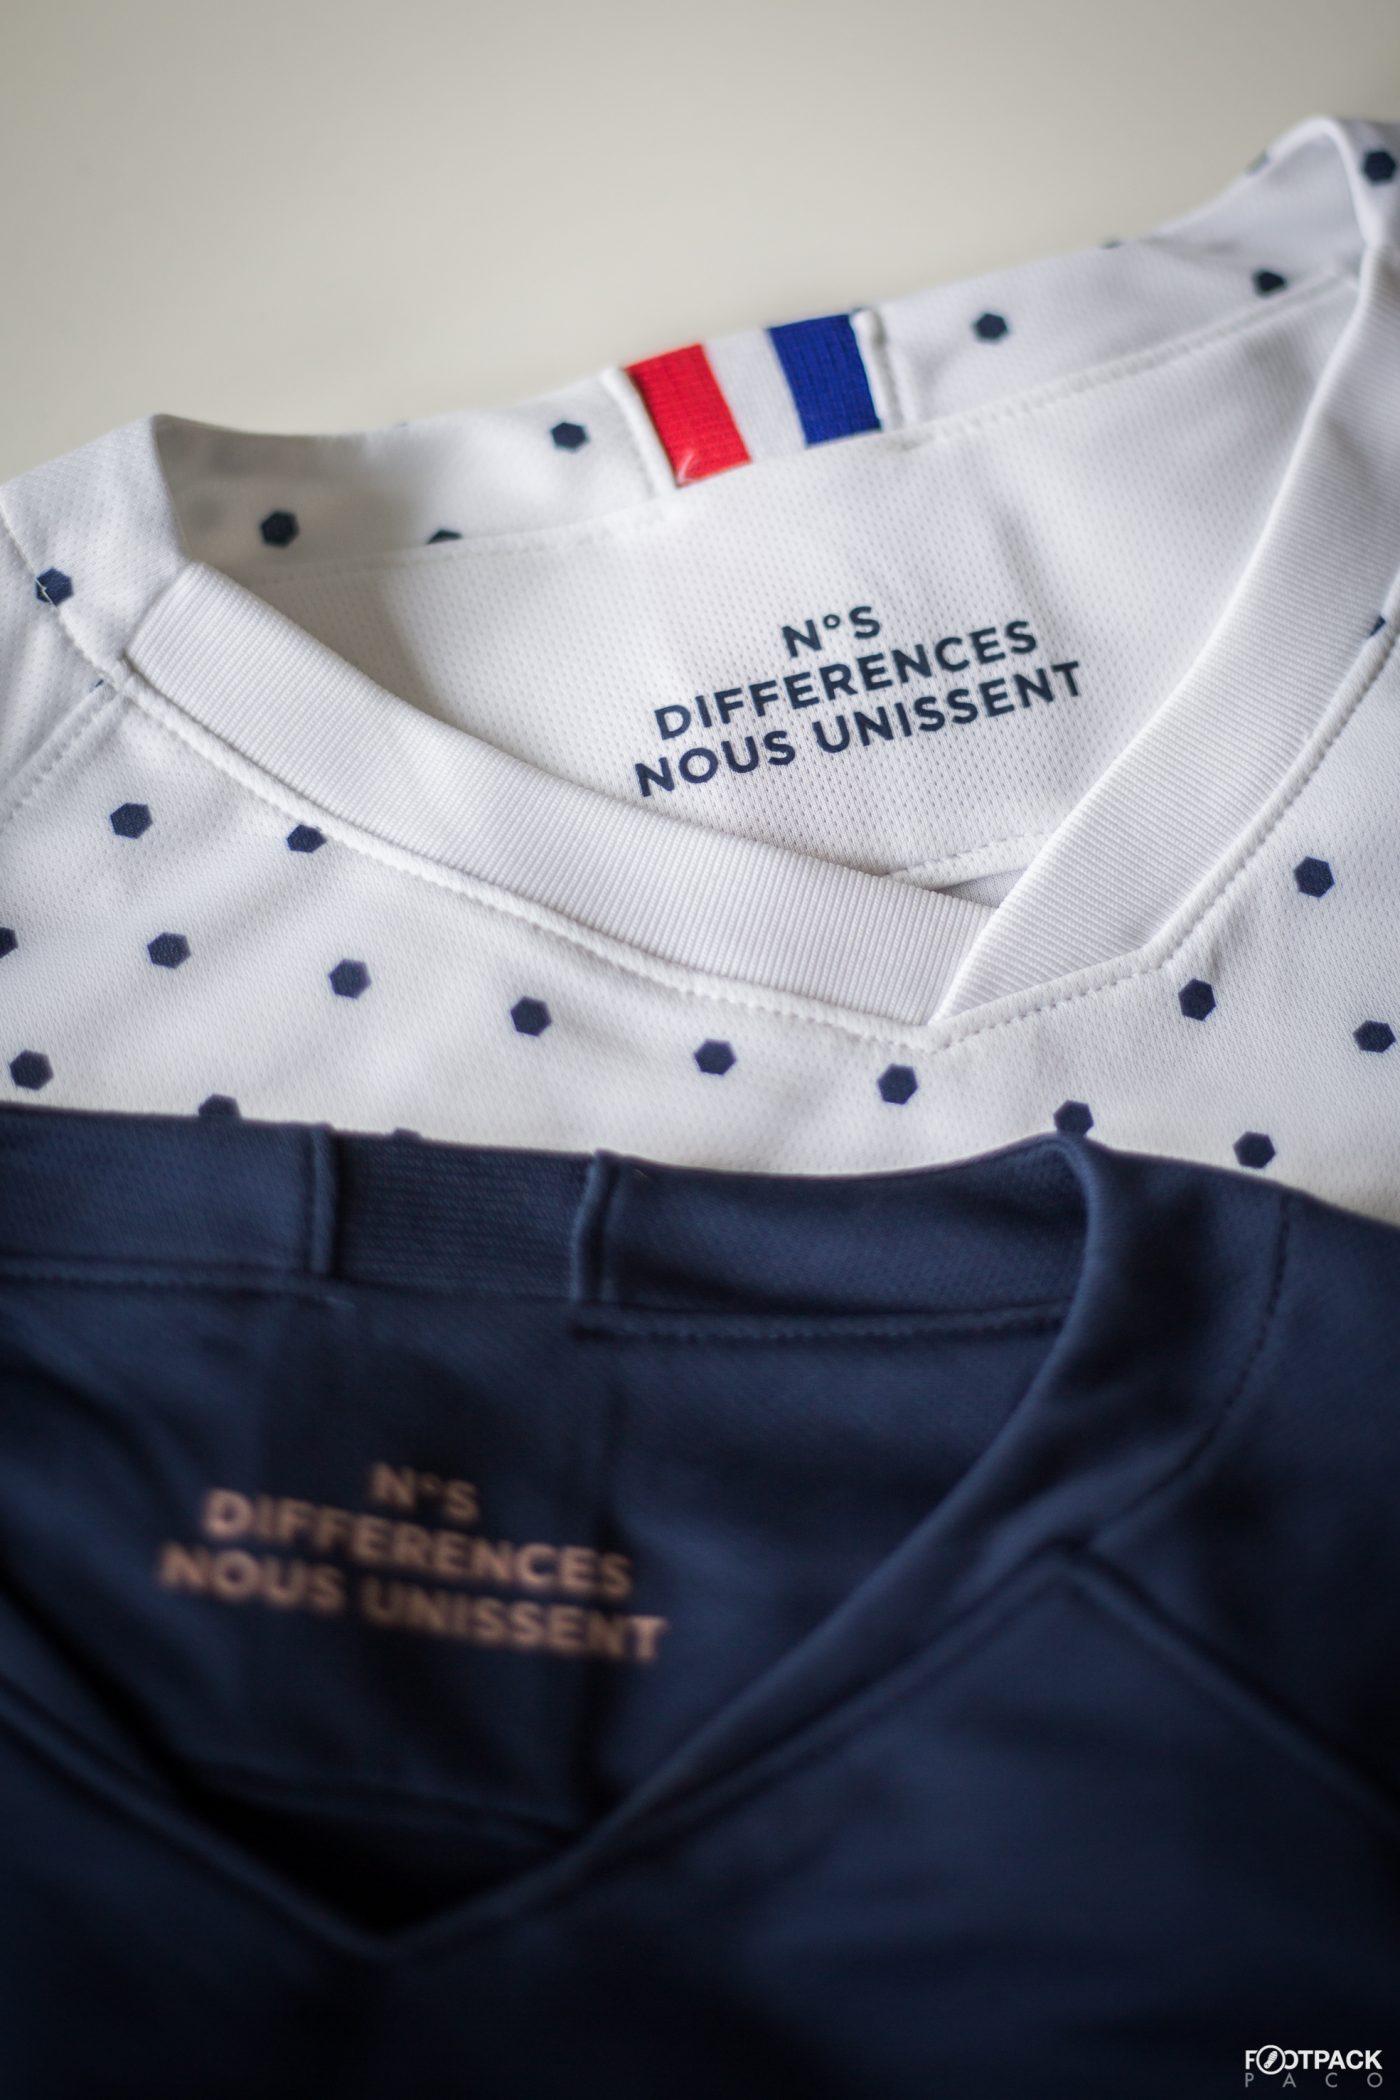 signification-nos-differences-nous-unissent-maillot-france-coupe-du-monde-feminine-nike-5